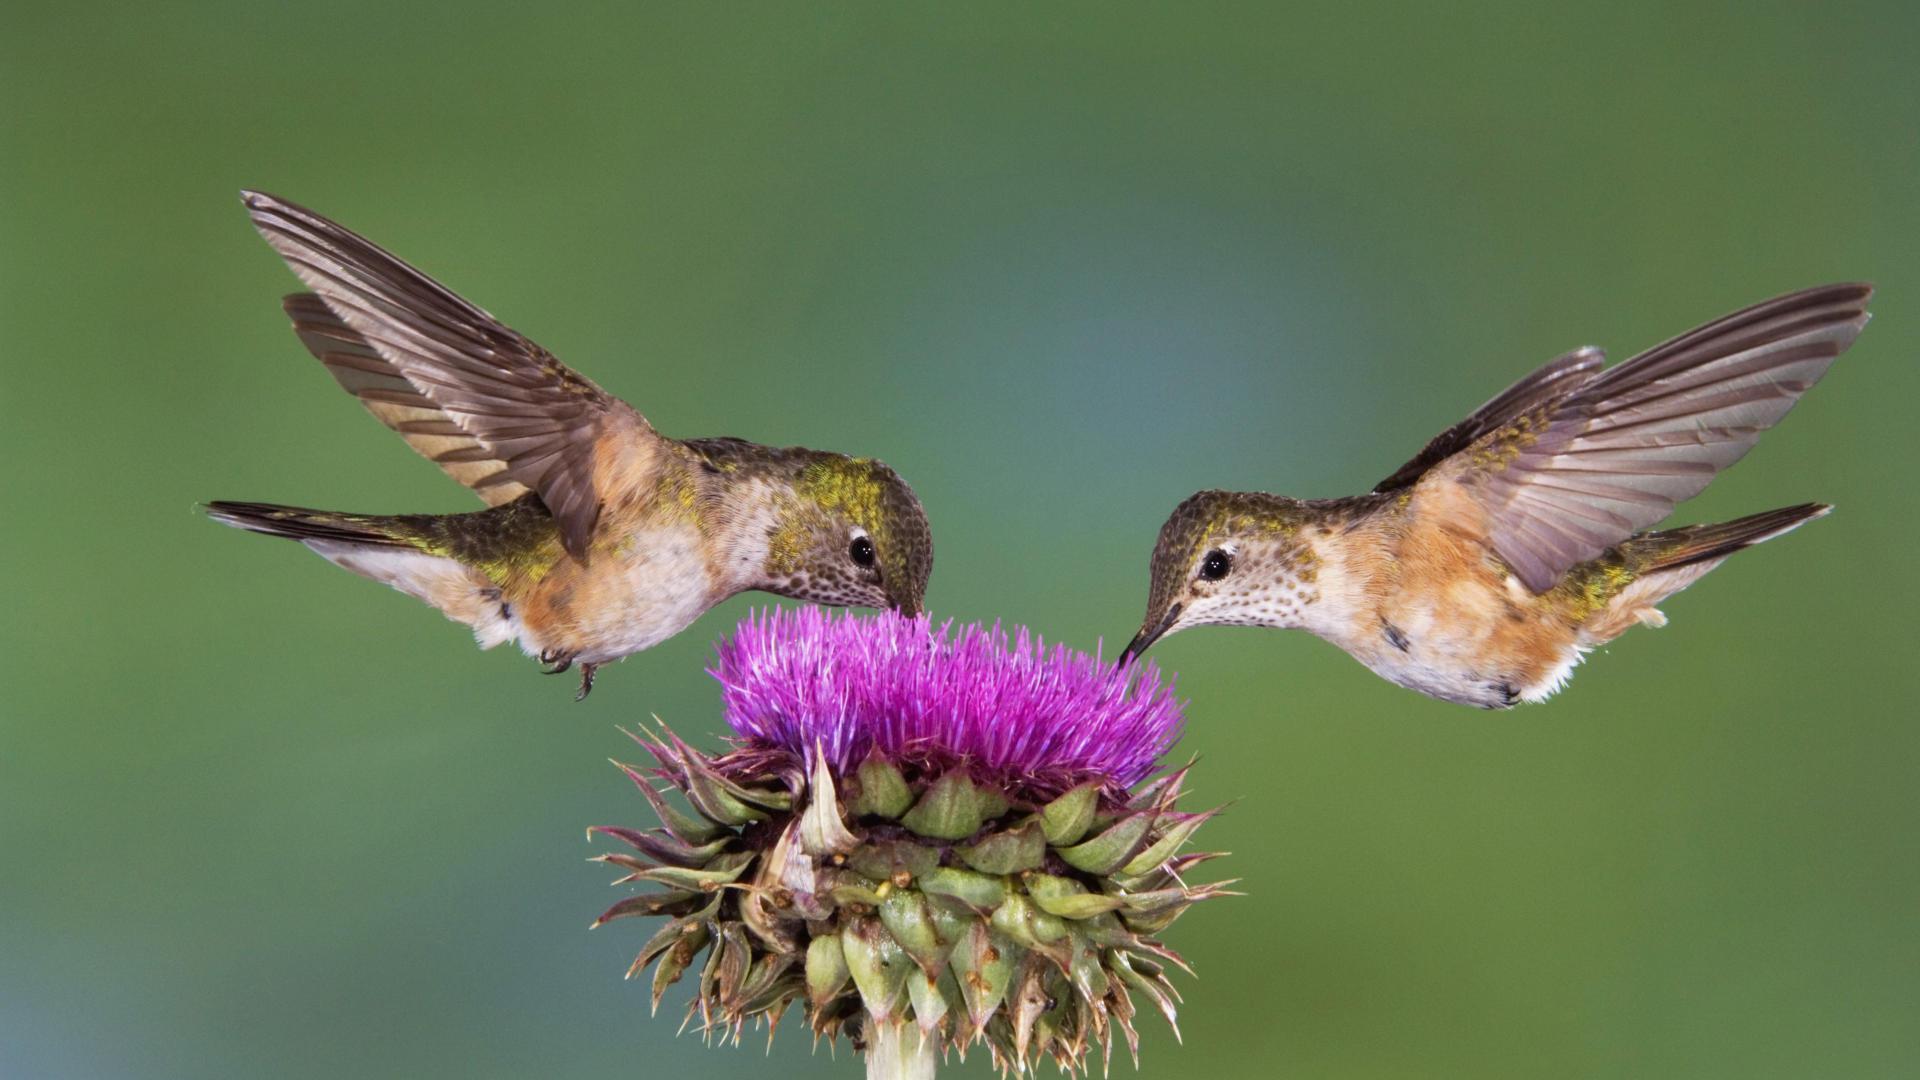 Hummingbird Pics, Animal Collection